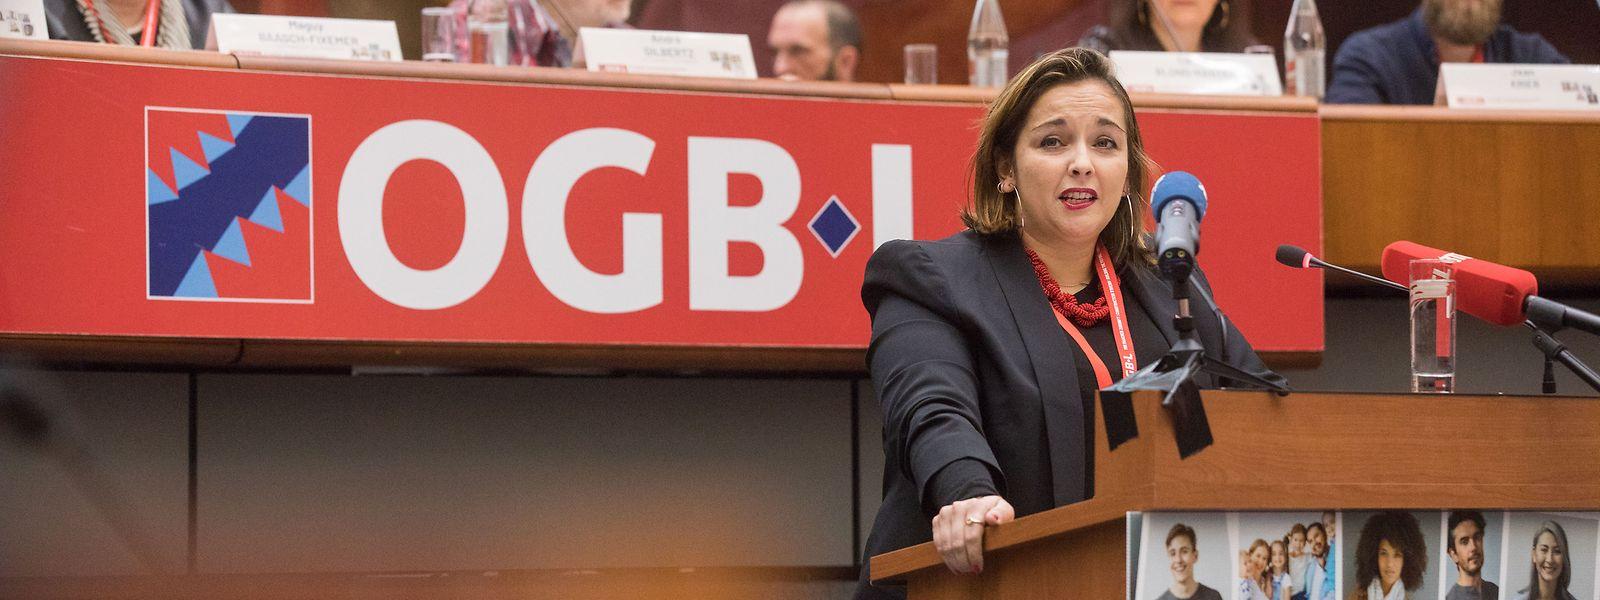 Politik, OGBL-Kongress, Nora Back.